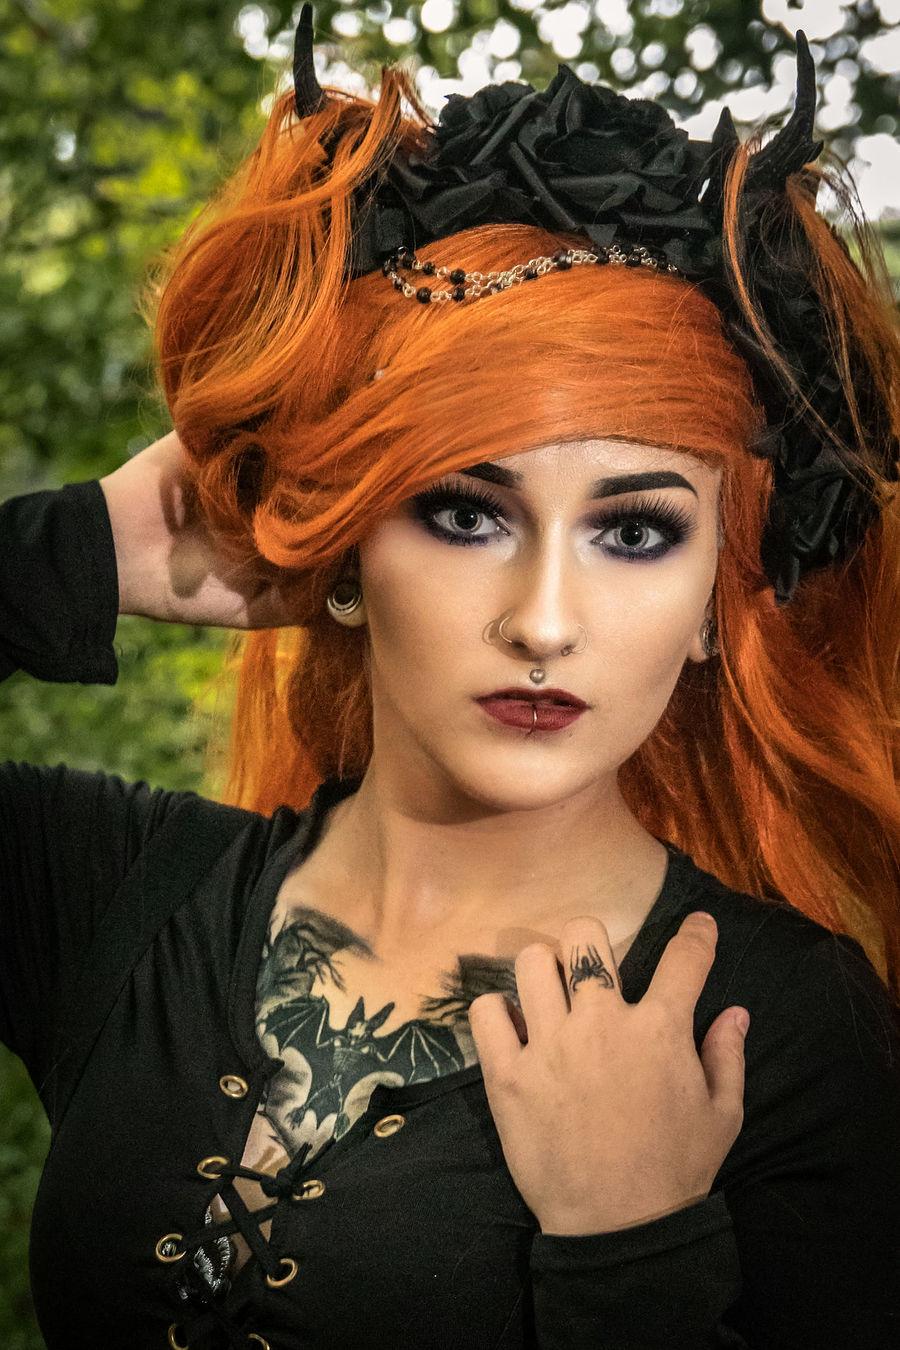 Vampire Princess. / Photography by PRPphoto, Model Jade Alexandra Model, Makeup by Jade Alexandra Model / Uploaded 8th November 2018 @ 10:37 PM